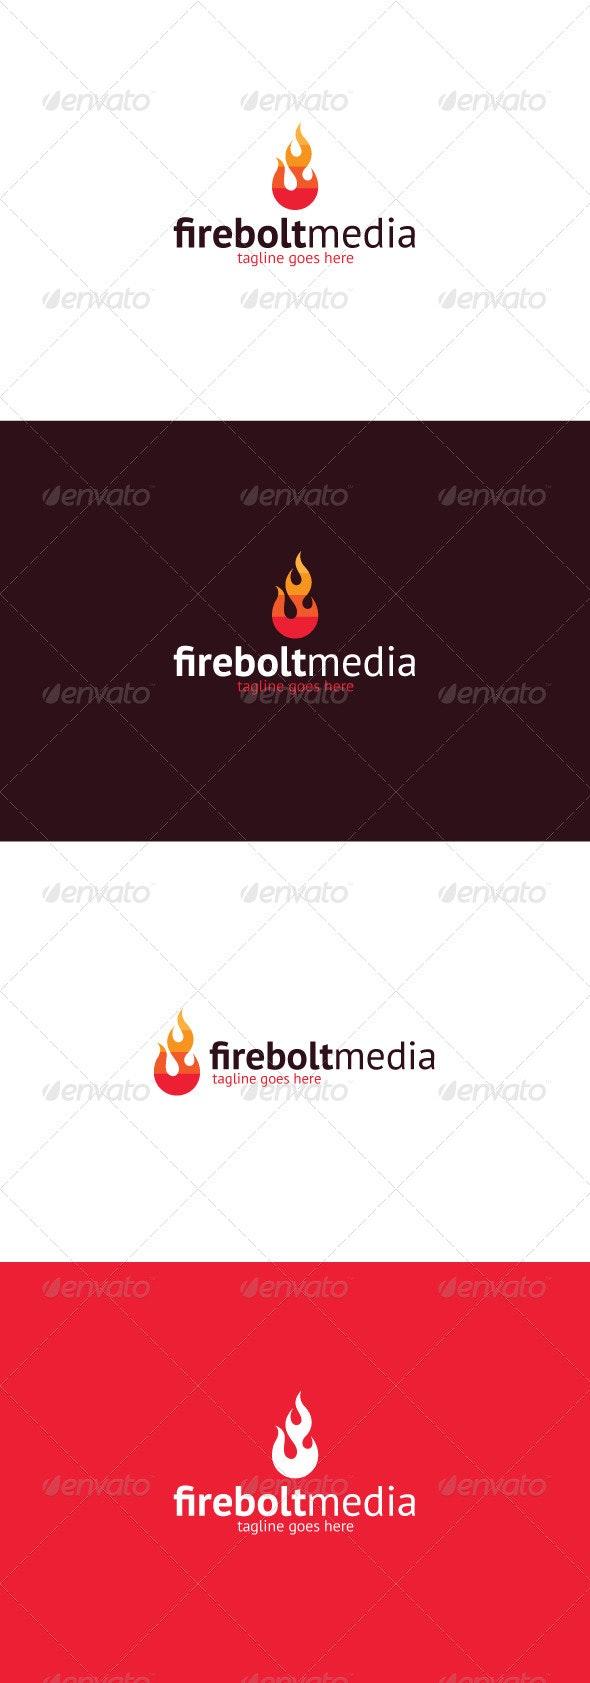 Firebolt Media Logo - Vector Abstract